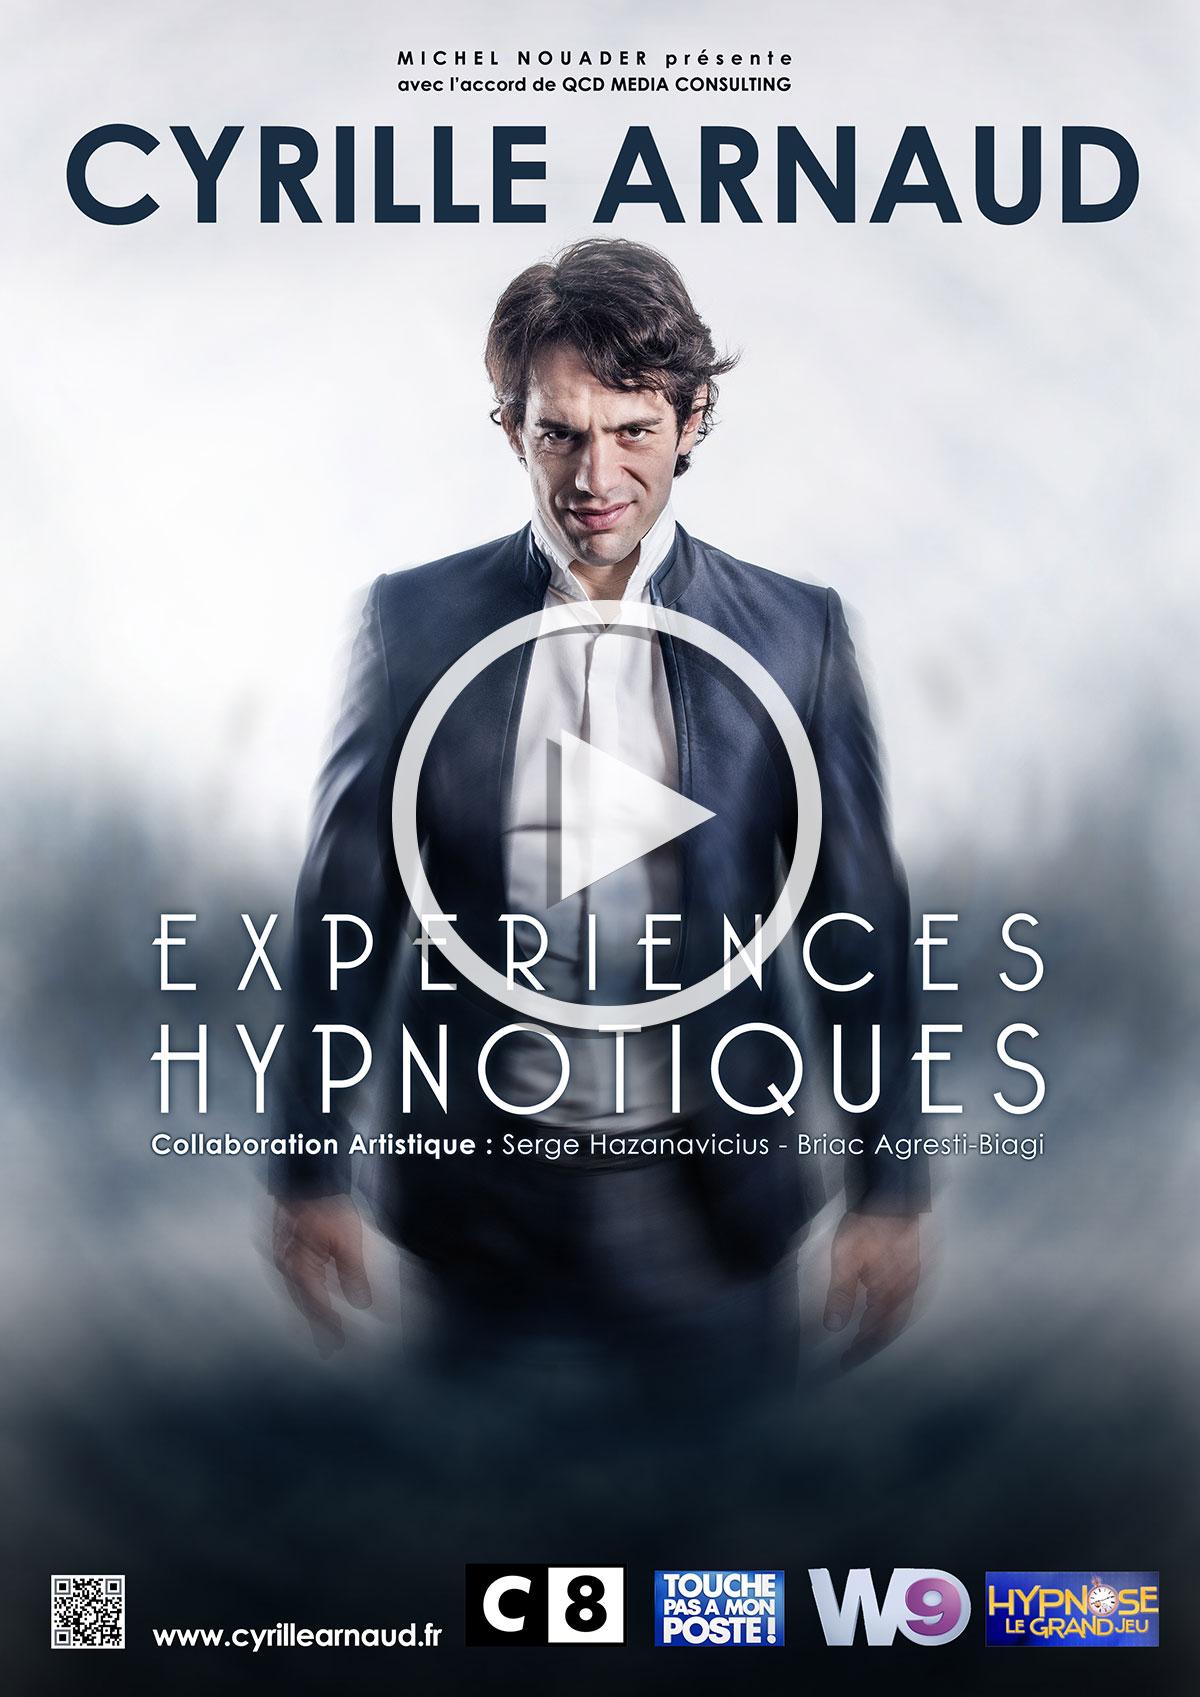 cyrille-arnaud-experiences-hypnotiques-affiche